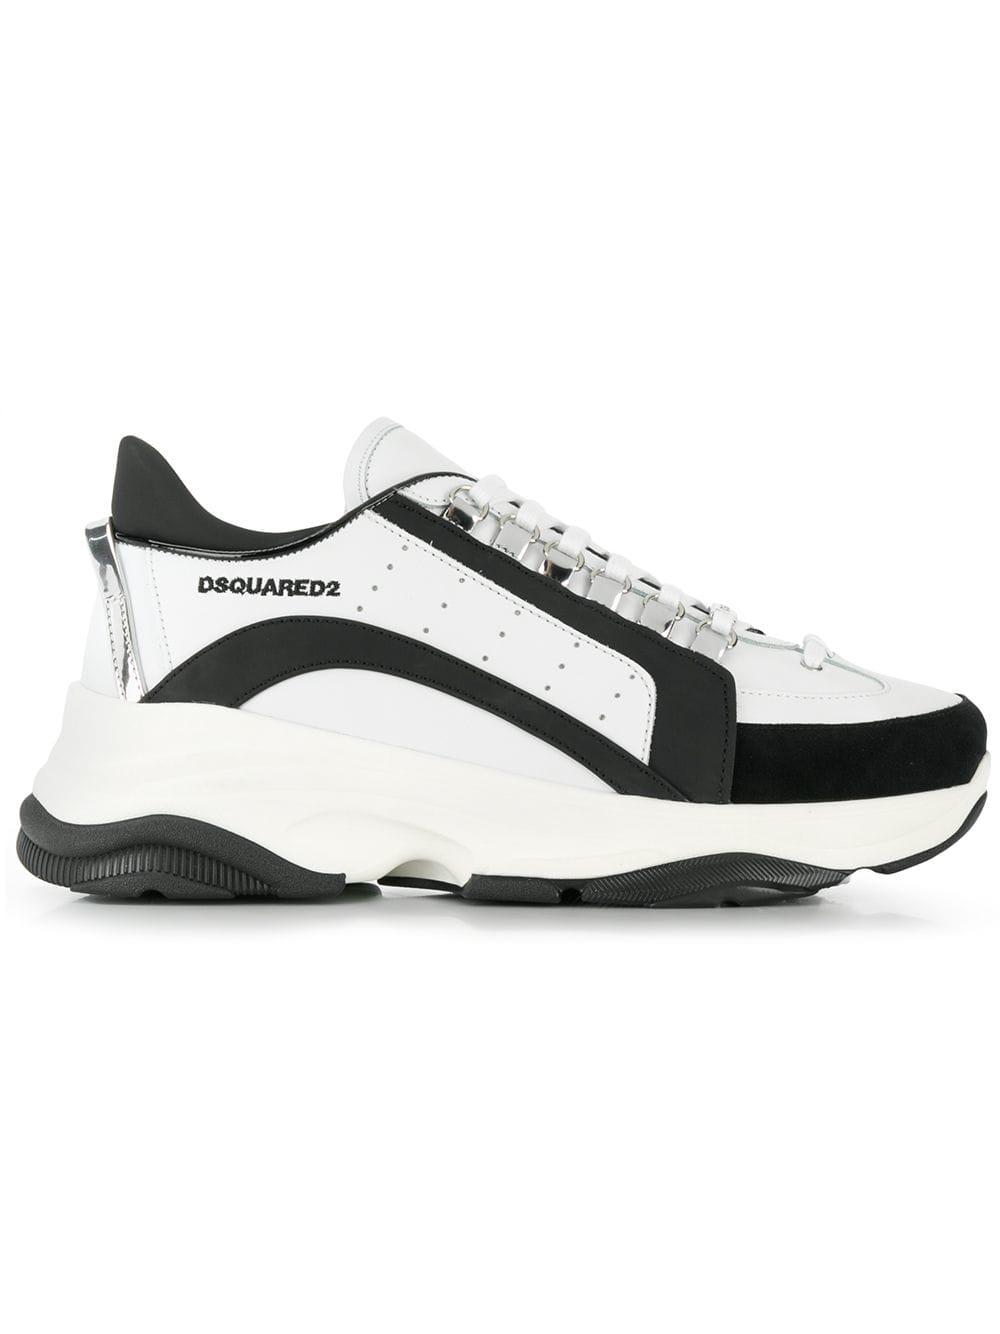 04ee97043fd Bumpy 551 Sneakers - DSQUARED2 - Russocapri